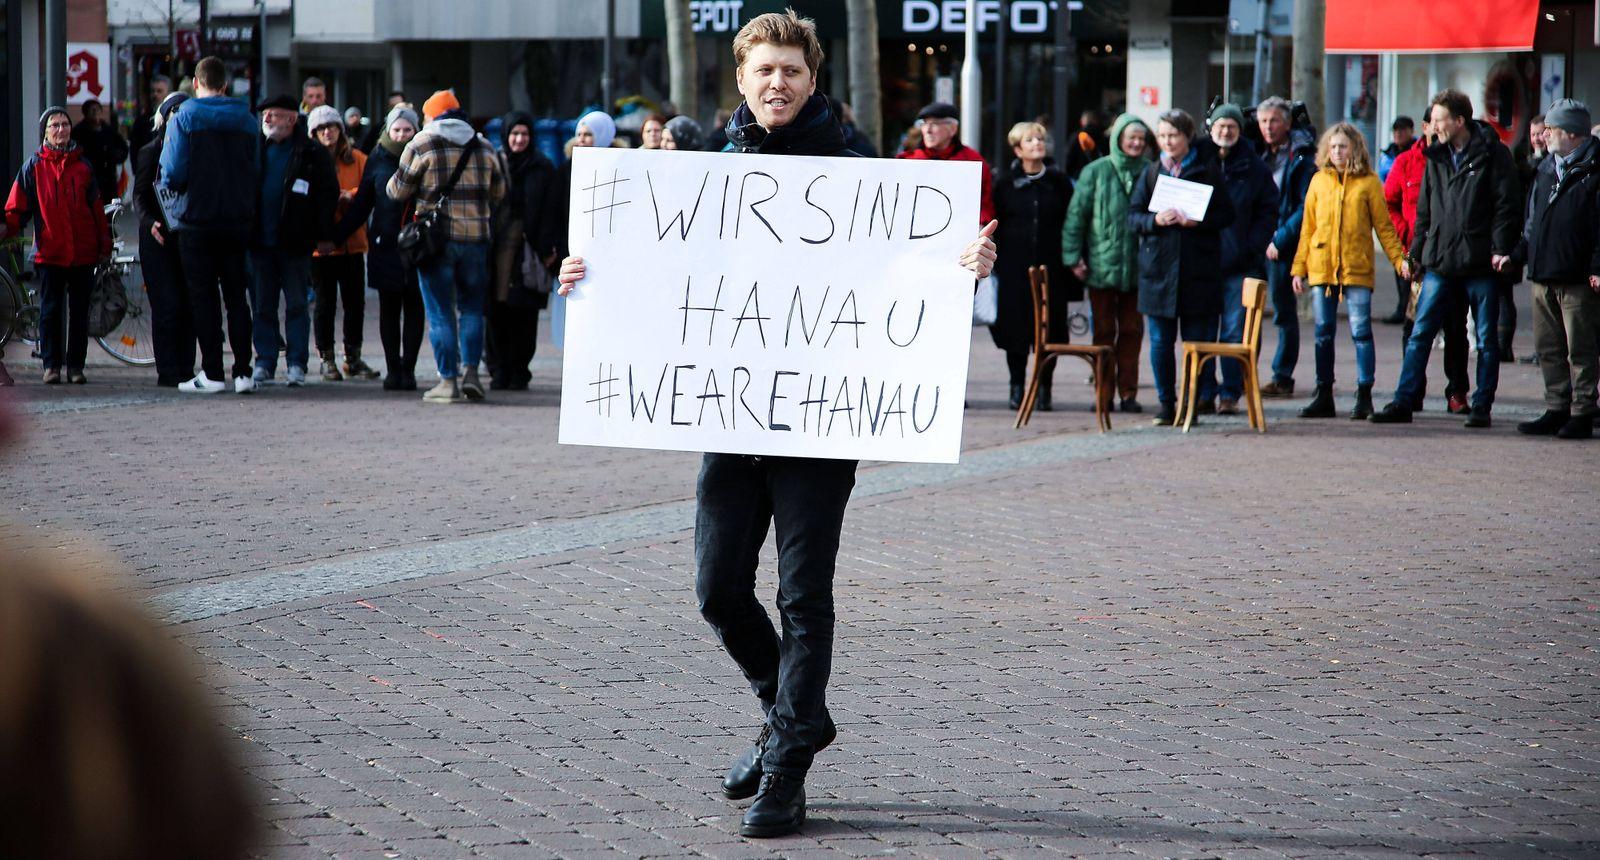 21.02.2020, xpsx, Lokal Hanau Bluttat in Hanau, Bluttat, Terror, Schiesserei, Mord, Tot , Gedenkfeier, Tobias R, Terror